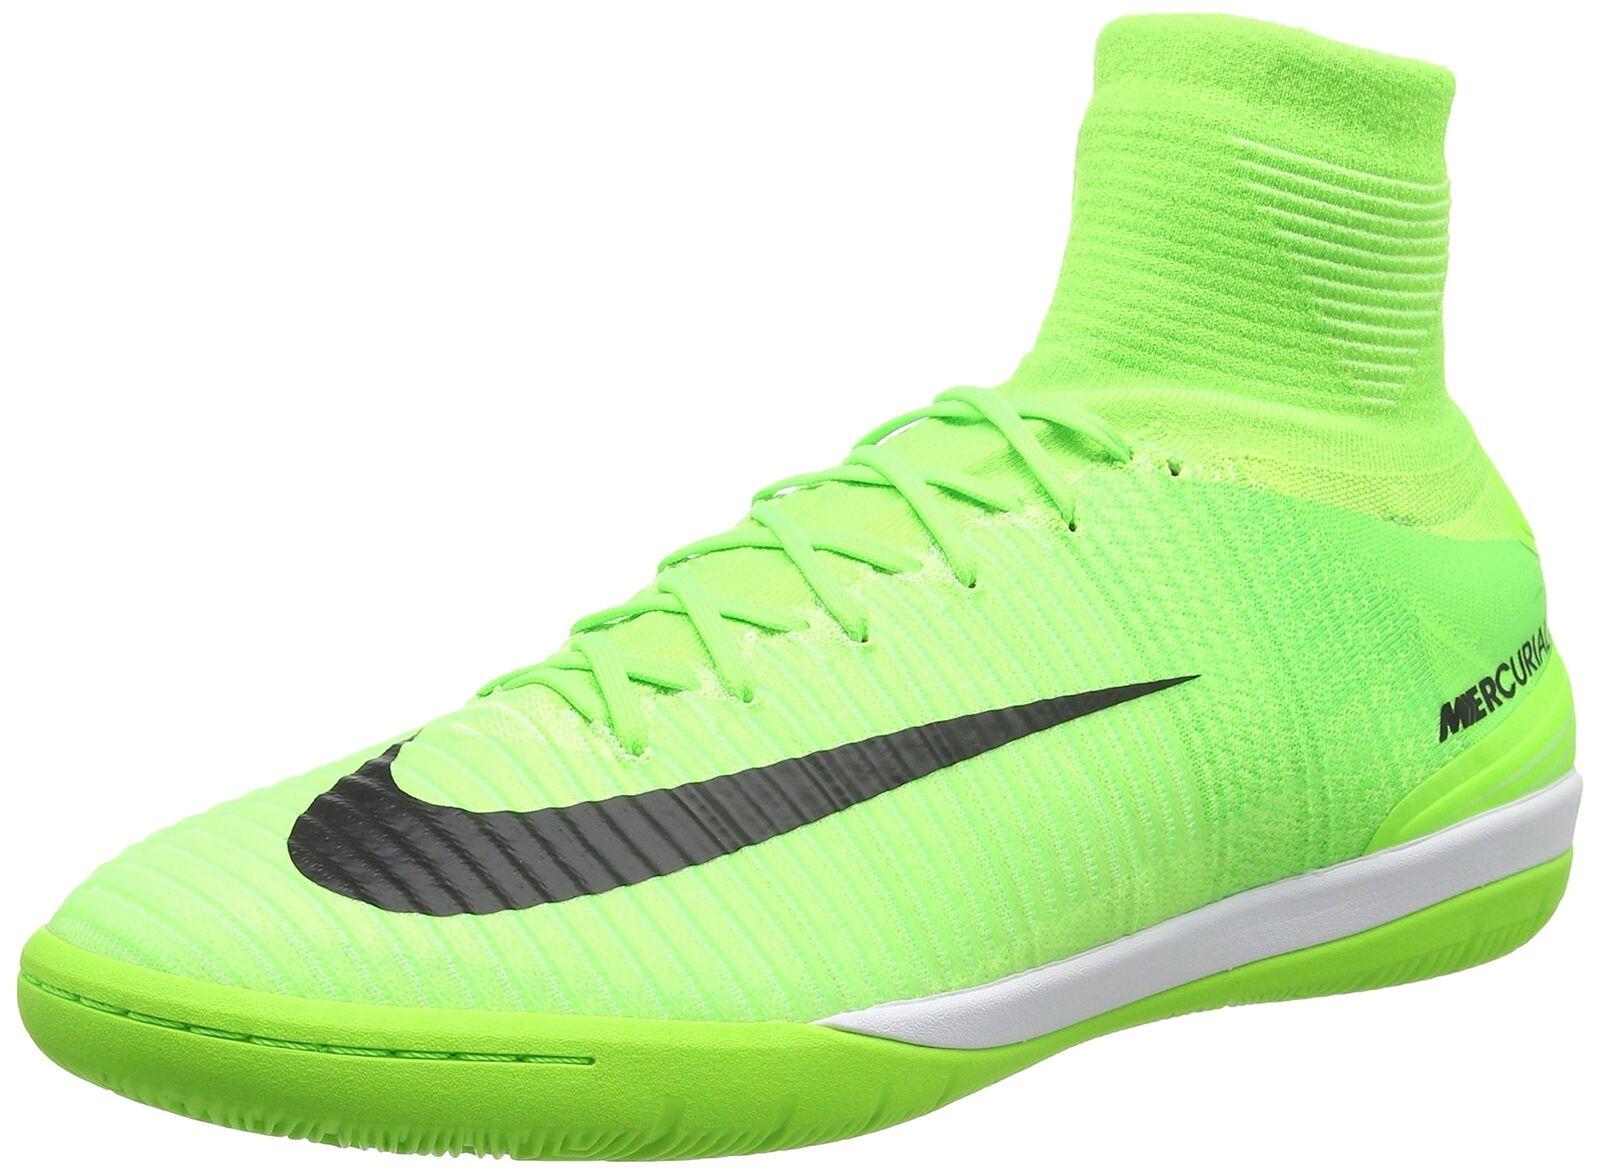 Nike mercurialx proximo ii - indoor - fußball - schuh nib